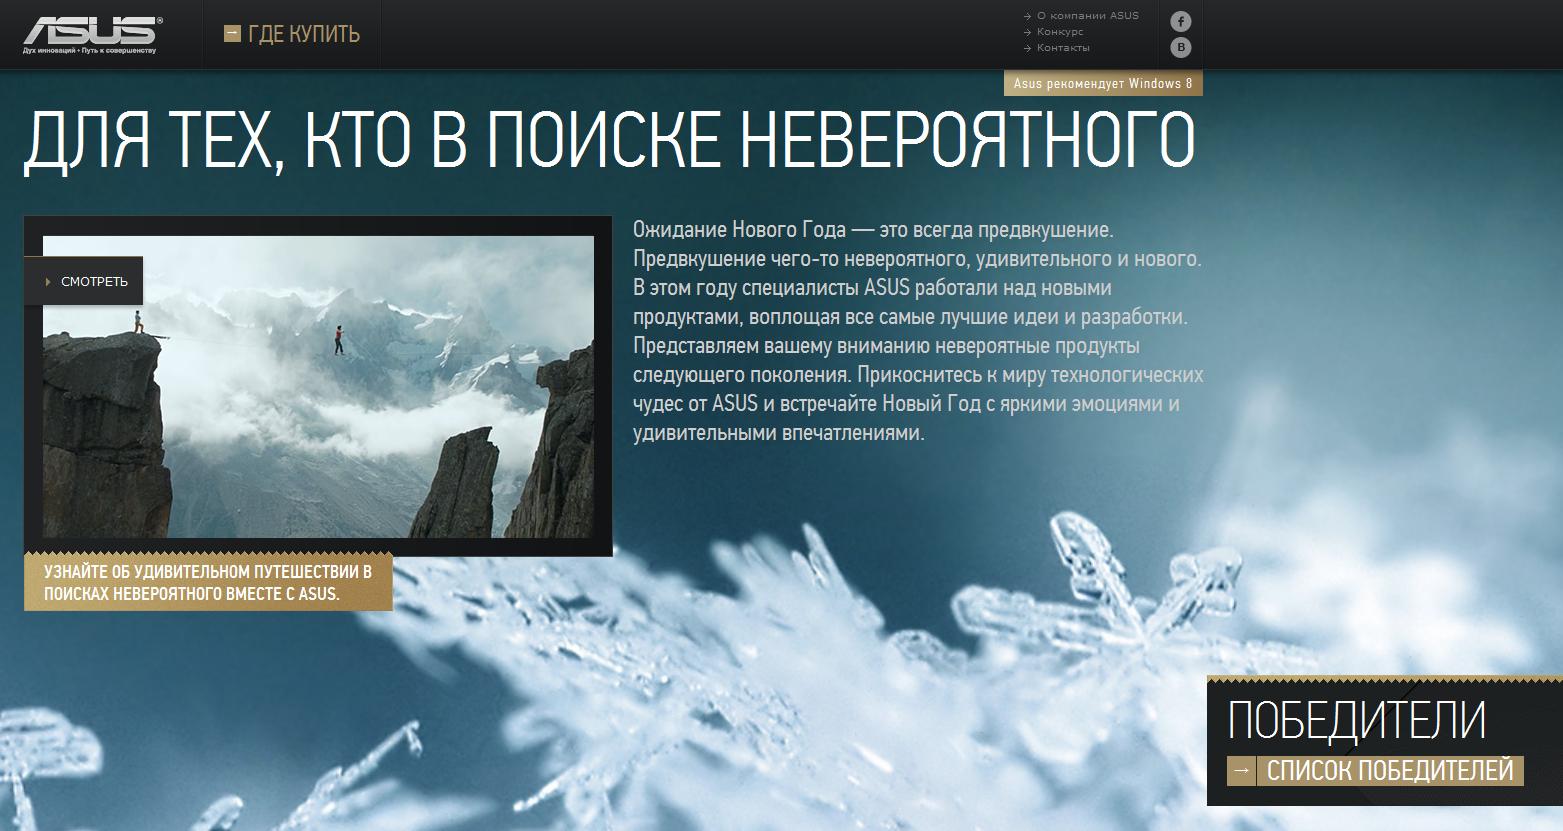 Новогодний проект Asus 2013